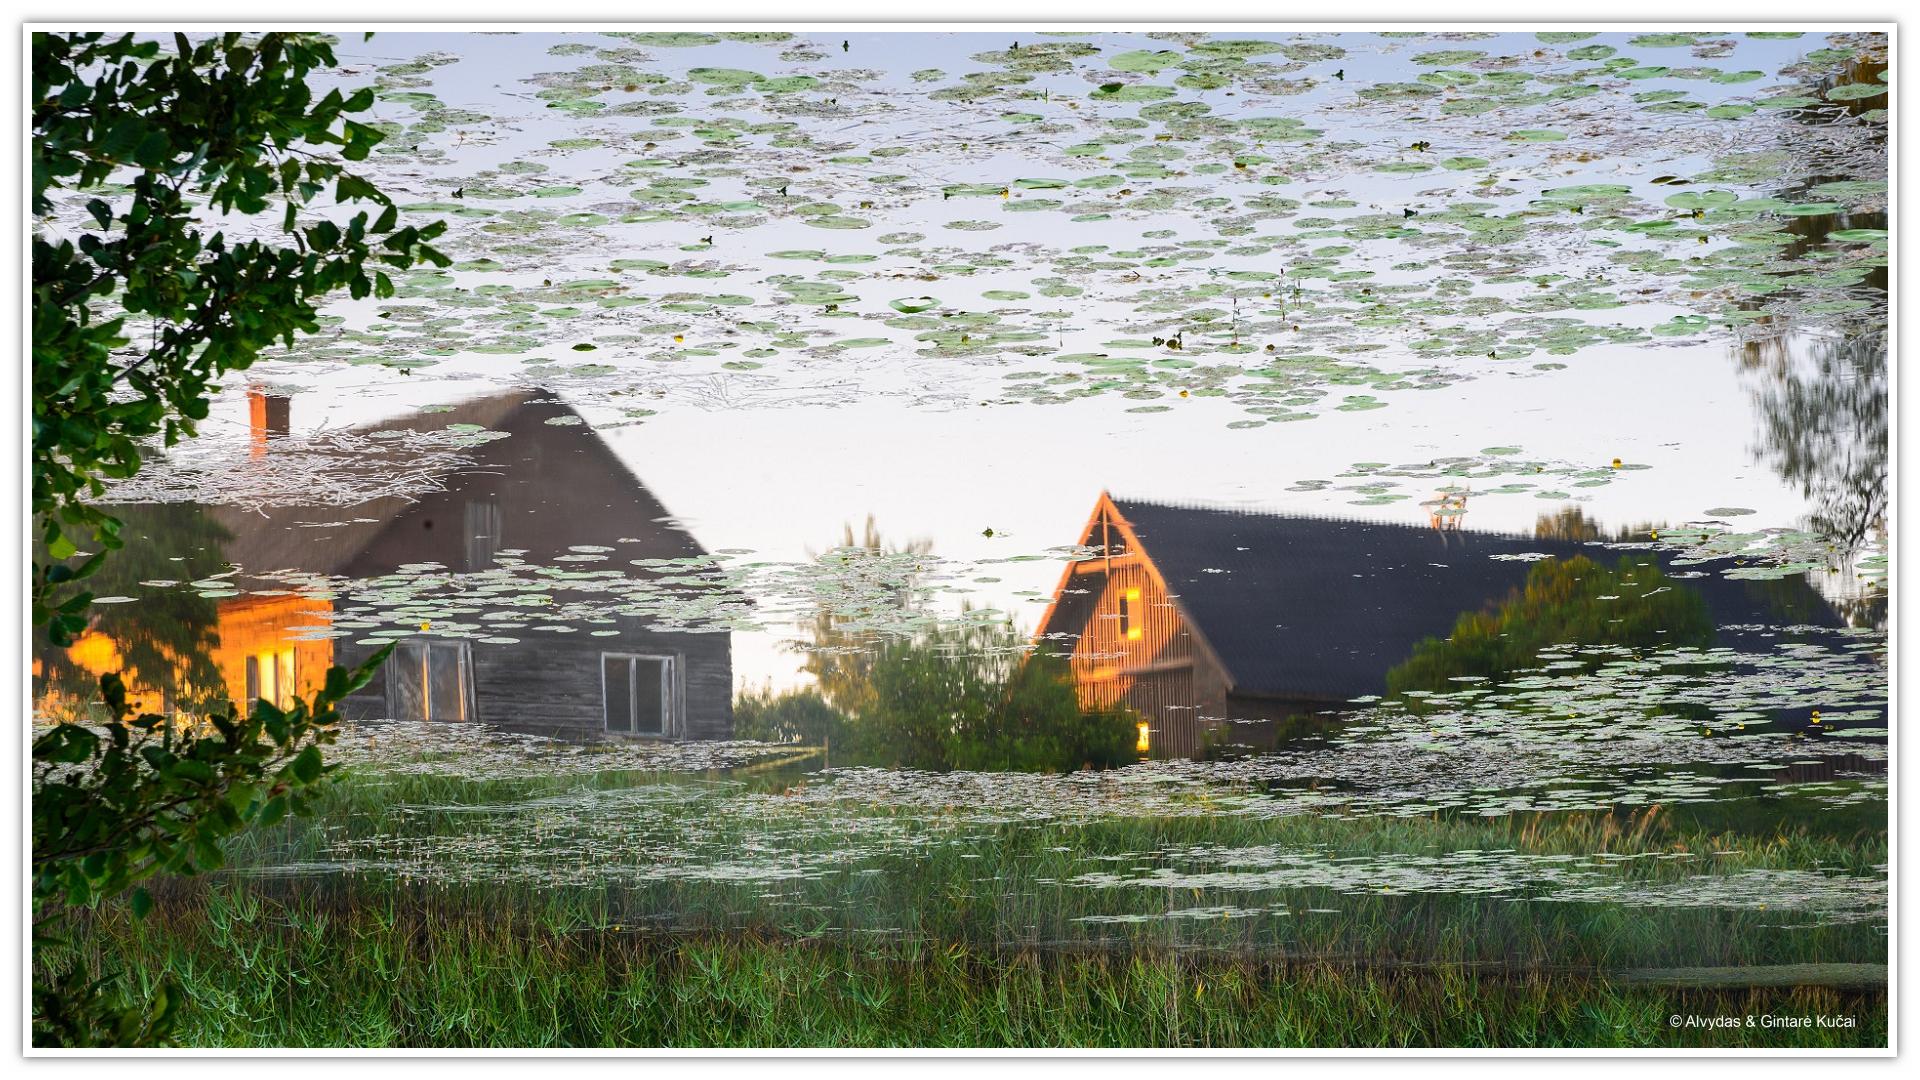 Gamta2.jpg